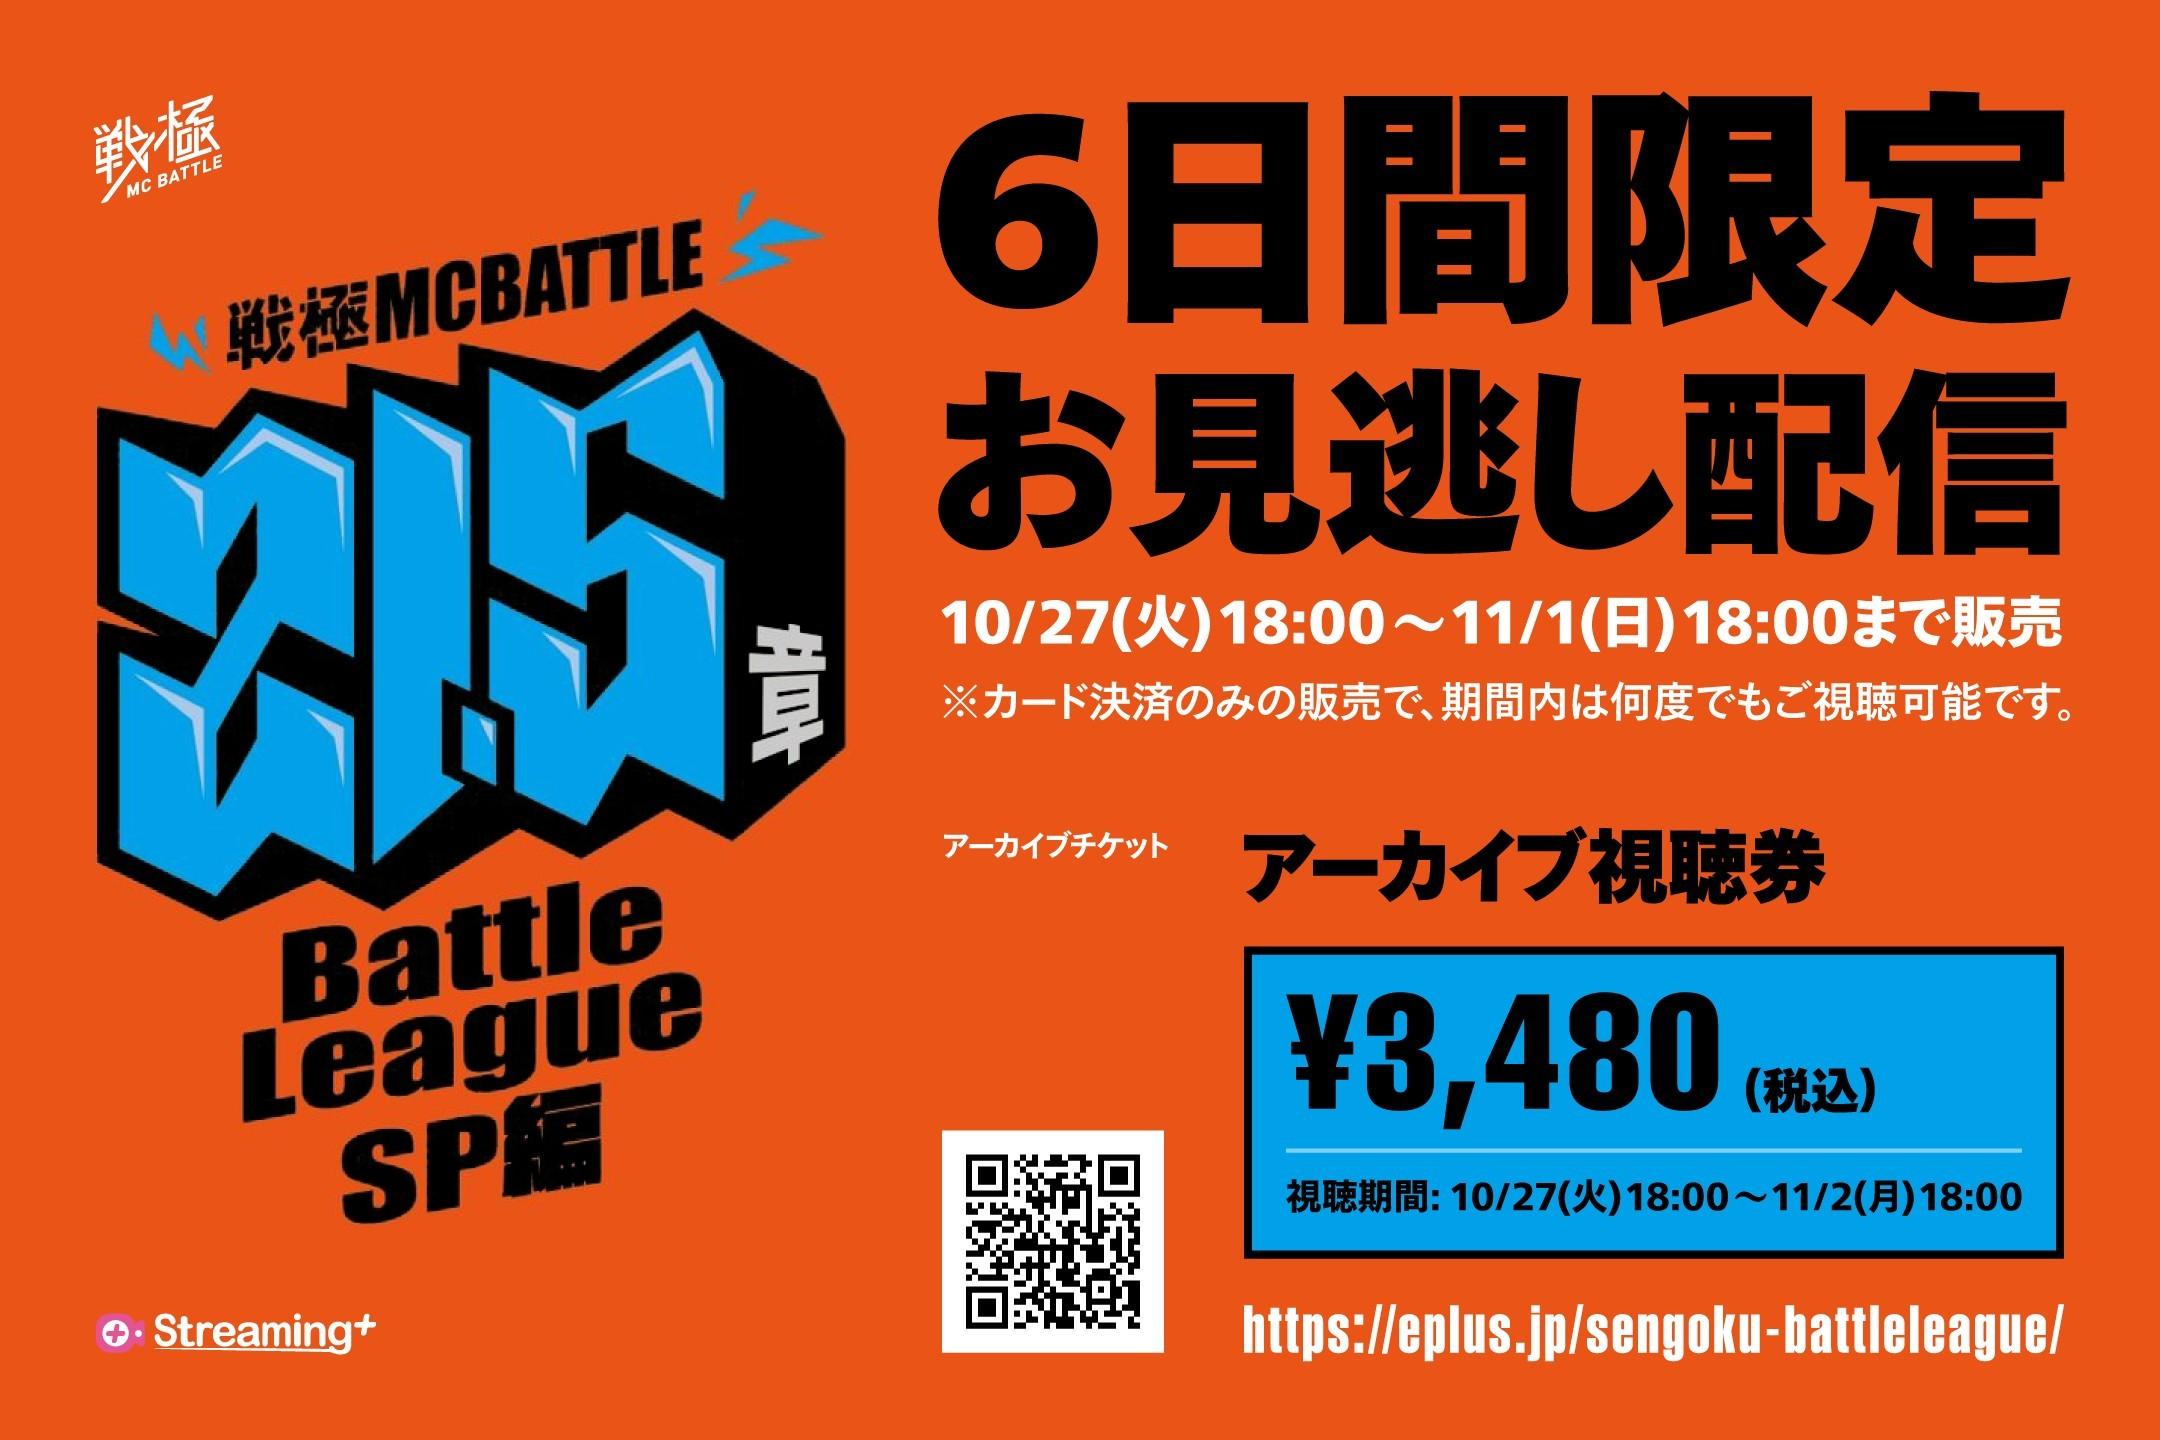 10/24 戦極MCBATTLE第21.5章 Battle League SP編 優勝は..._e0246863_01100826.jpg